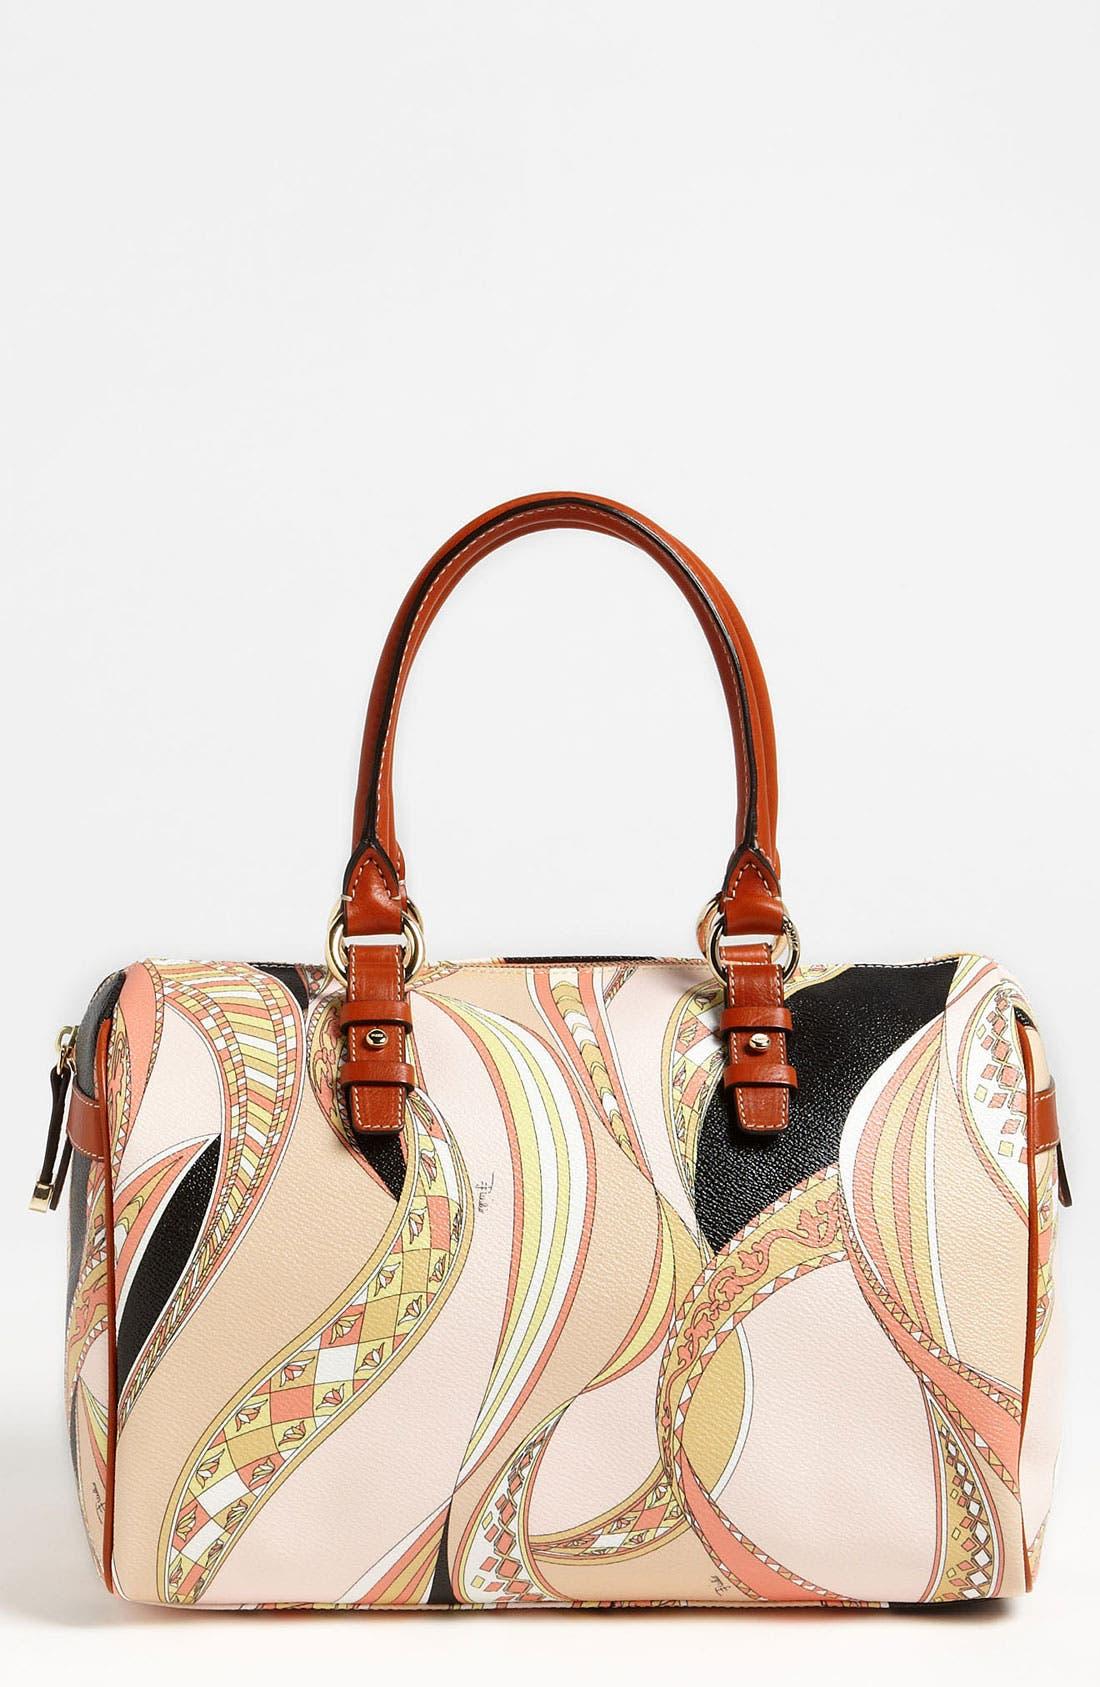 Alternate Image 1 Selected - Emilio Pucci 'Large' Boston Bag